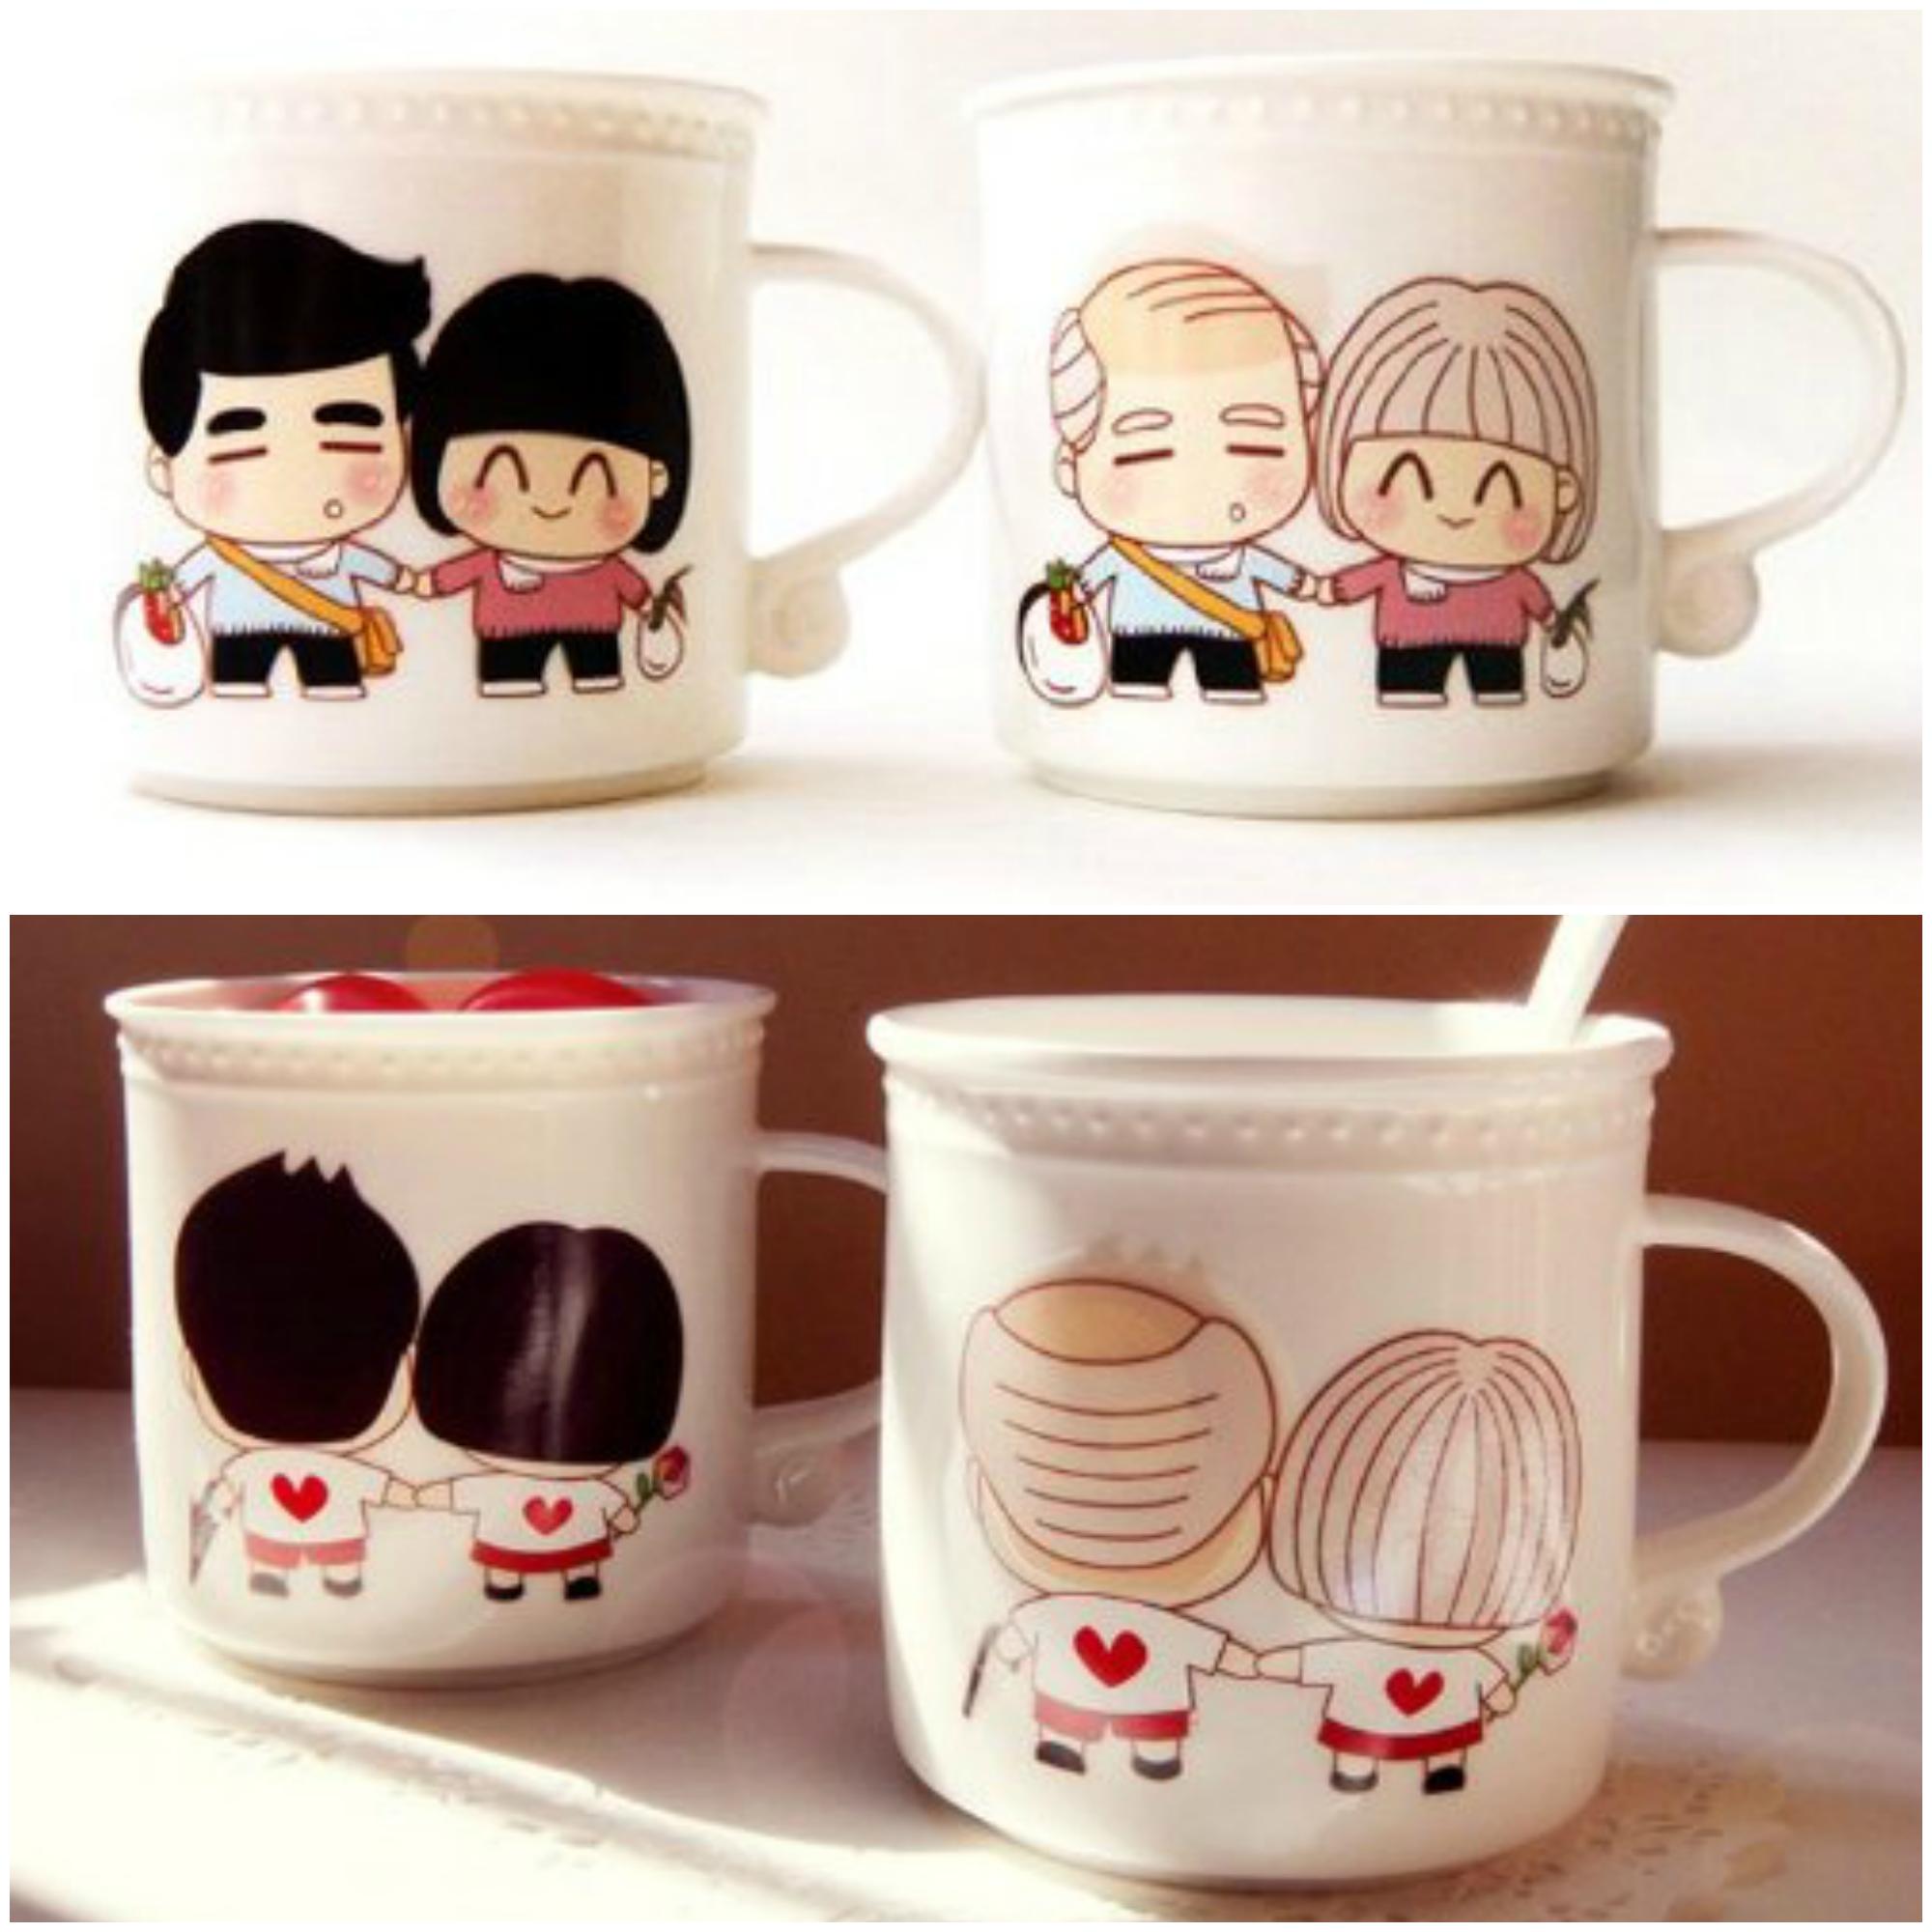 Growing Old Together Coffee Mugs